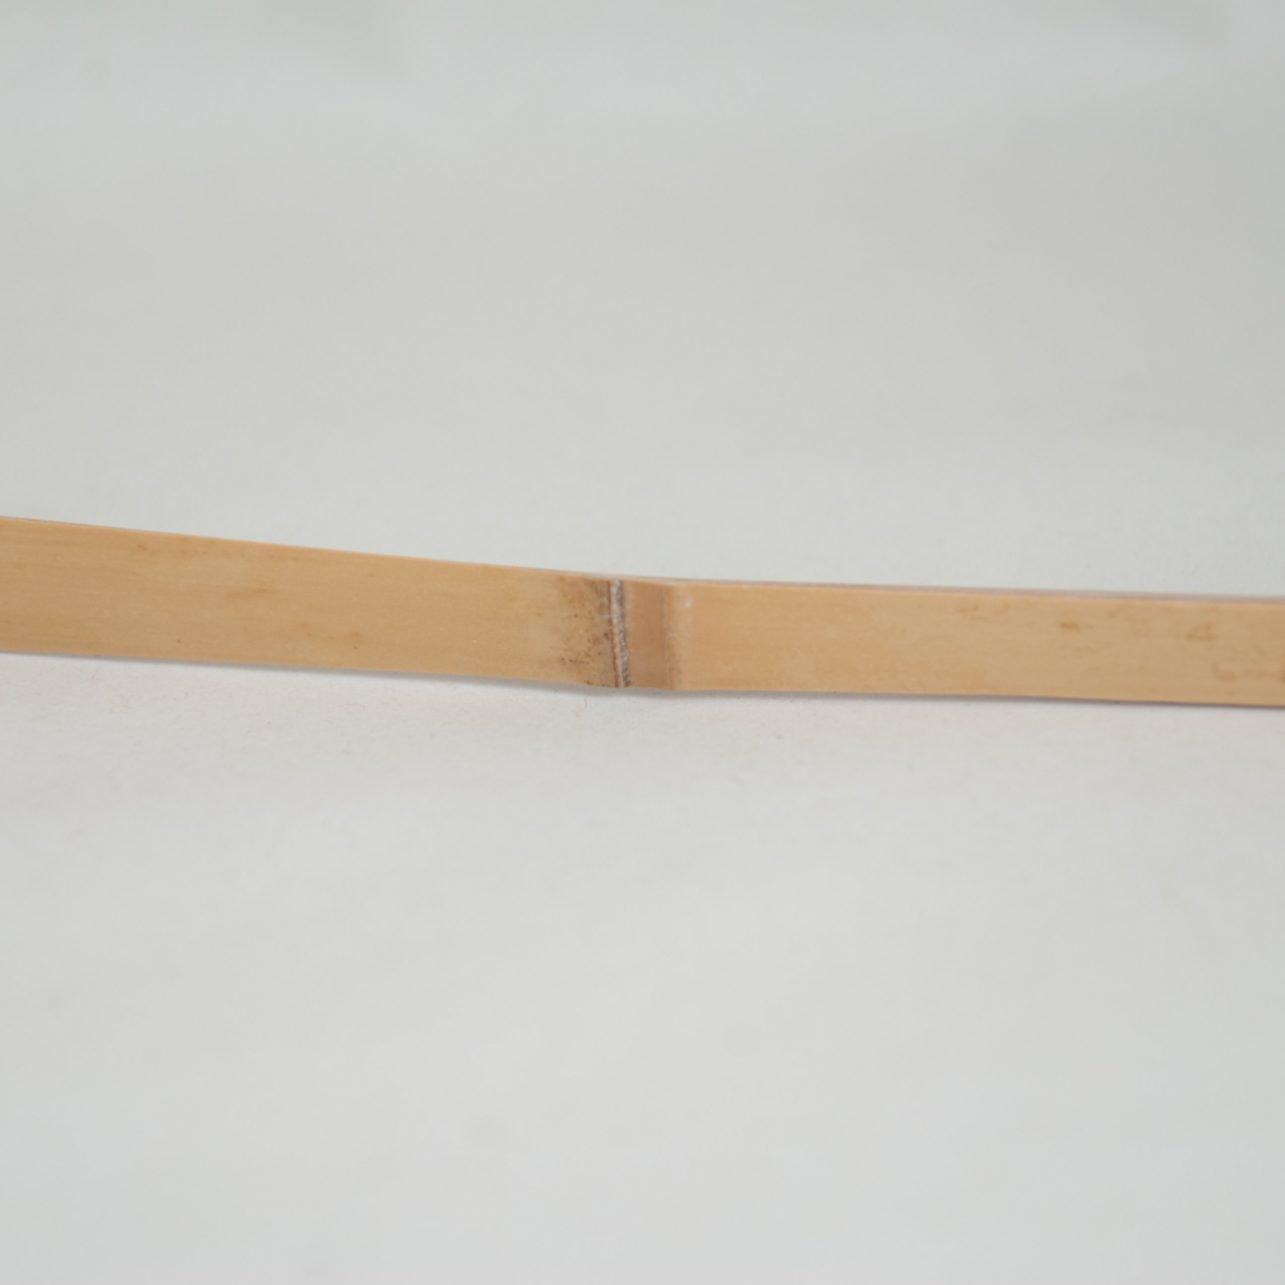 Bamboo Tea Scoop made in Japan